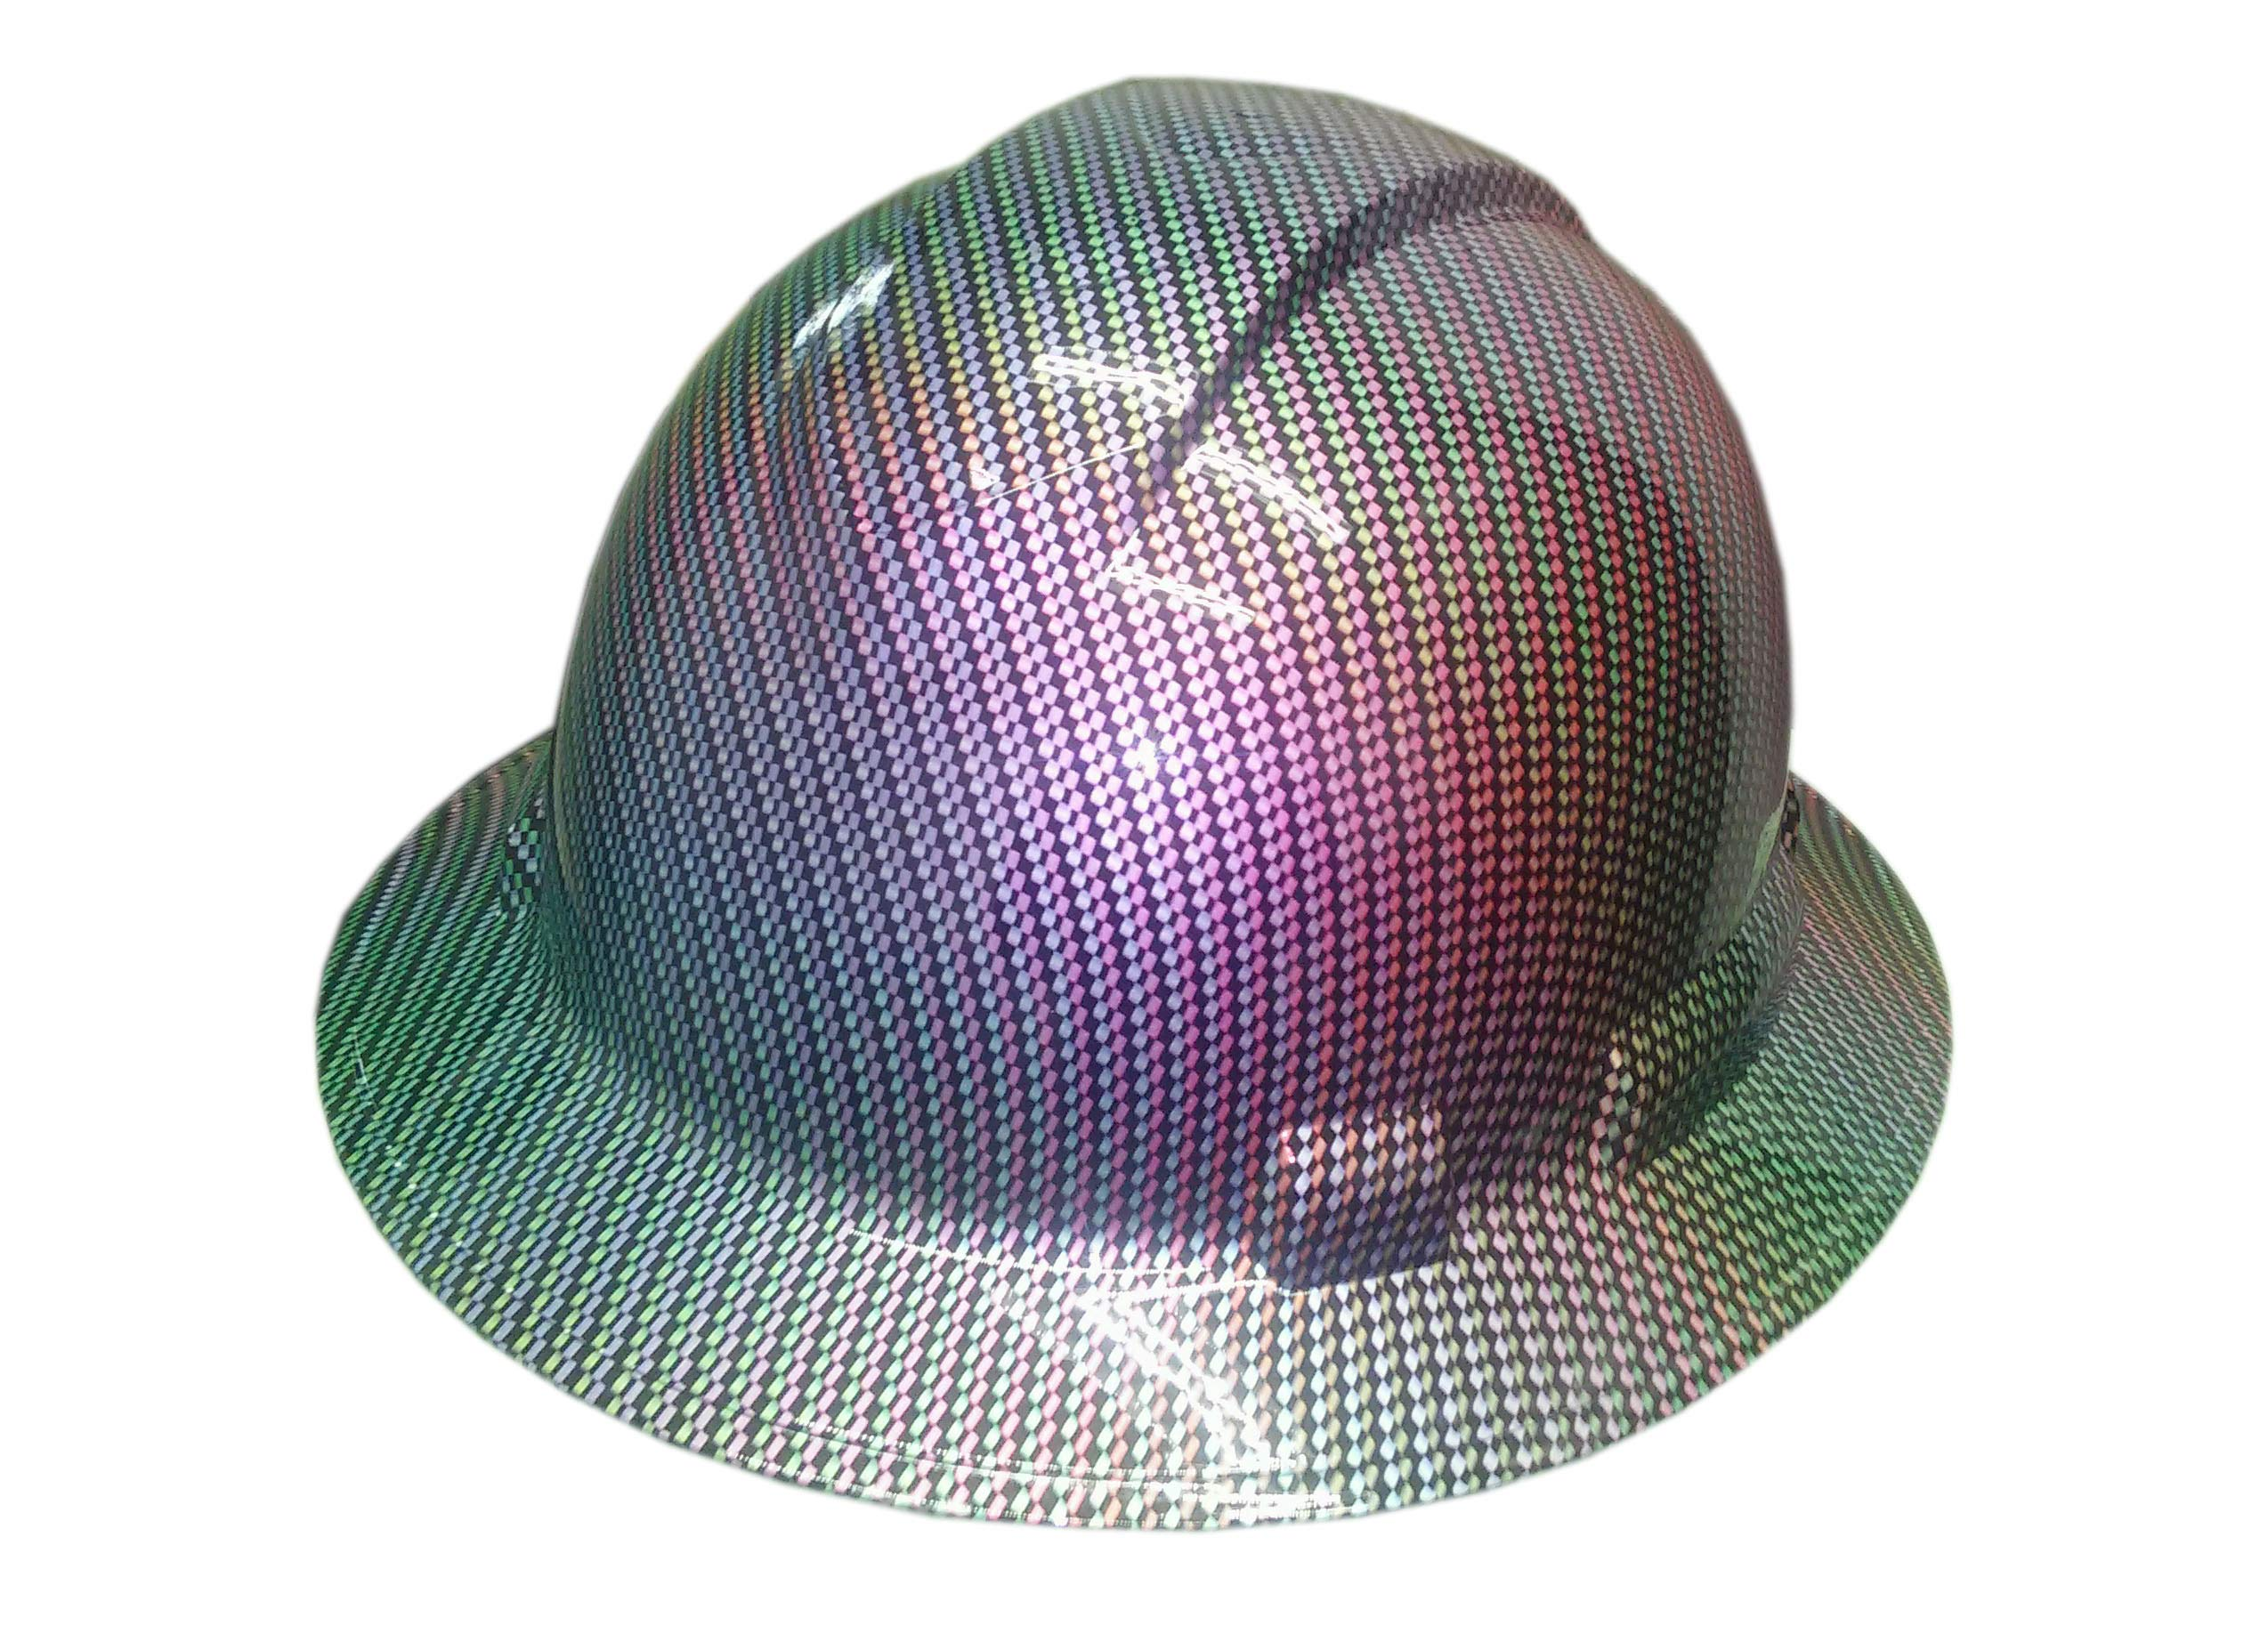 Izzo Graphics Chameleon Carbon Fiber Pyramex Ridgeline Full Brim Hard Hat by Pyramex Ridgeline Full Brim Hard Hat